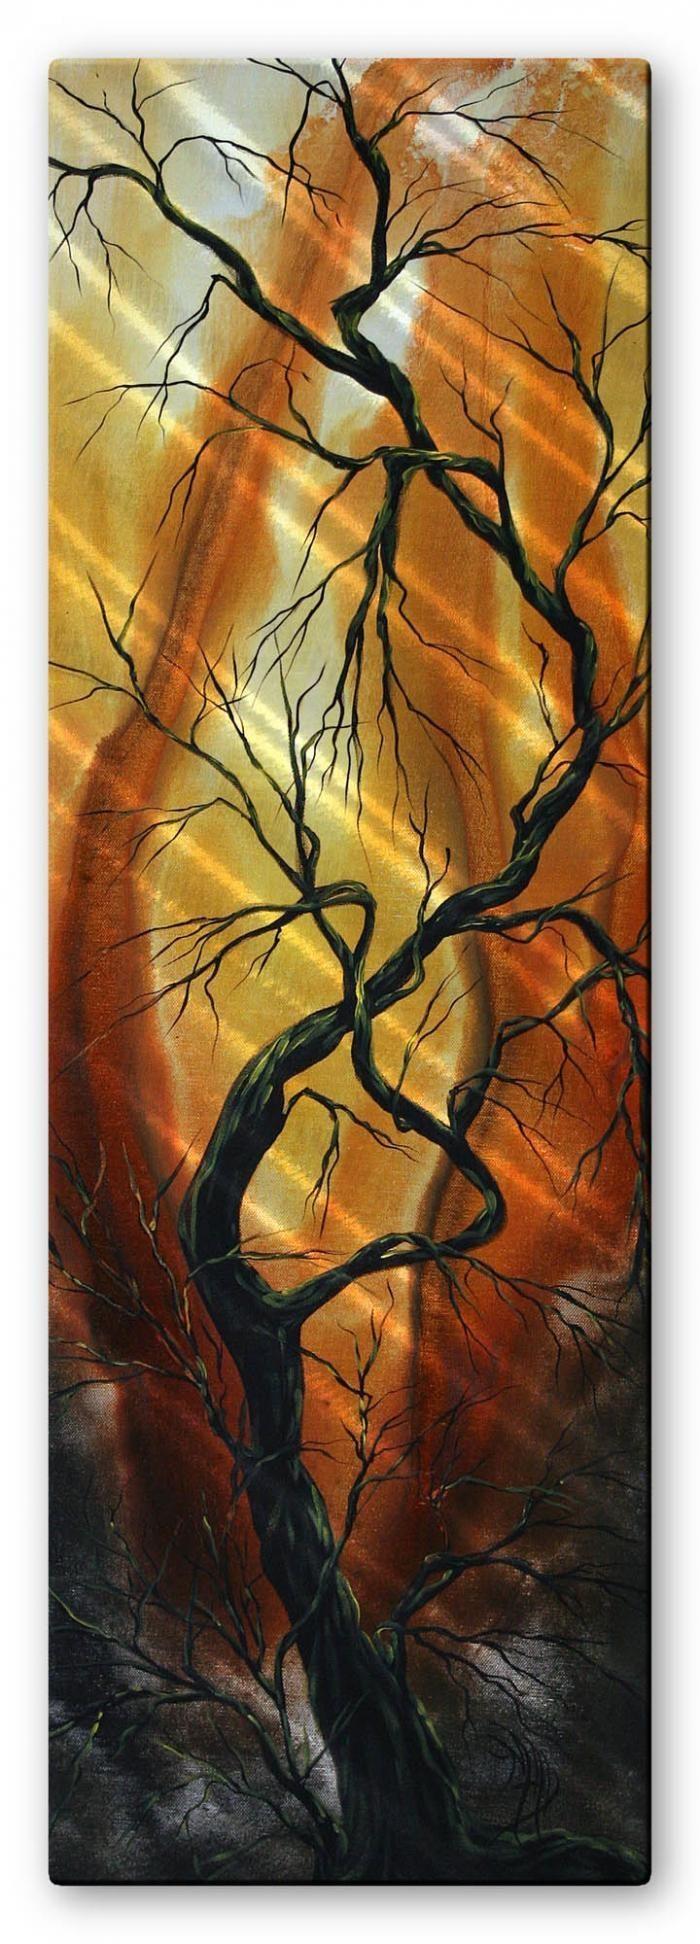 65 Best Artist- Megan Duncanson Images On Pinterest | Abstract Art intended for Megan Duncanson Metal Wall Art